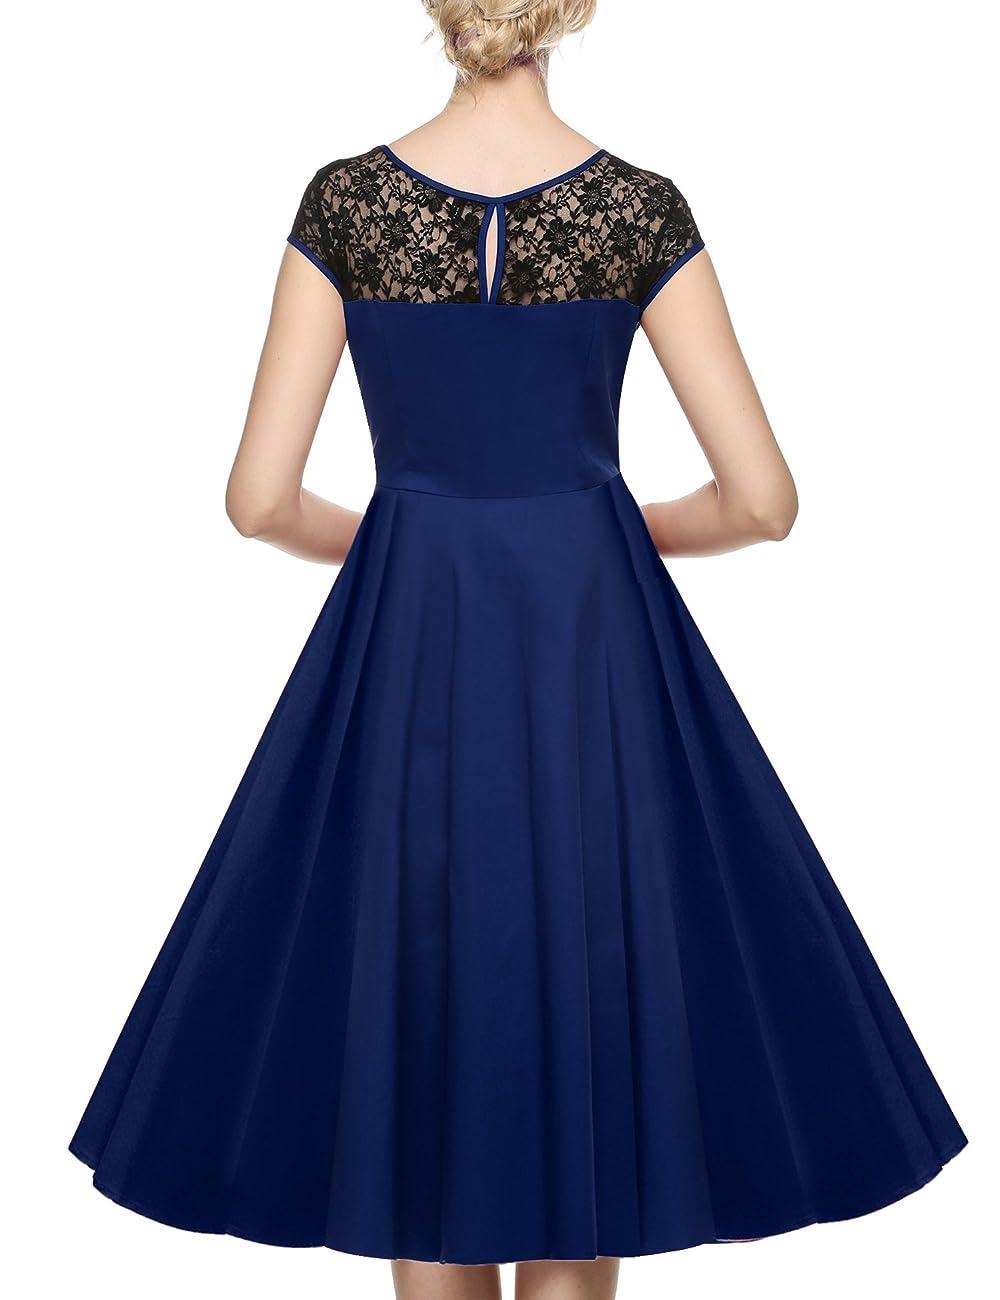 ACEVOG Women's Lace Crochet Sleeveless Cotton Vintage Tea Dress 1